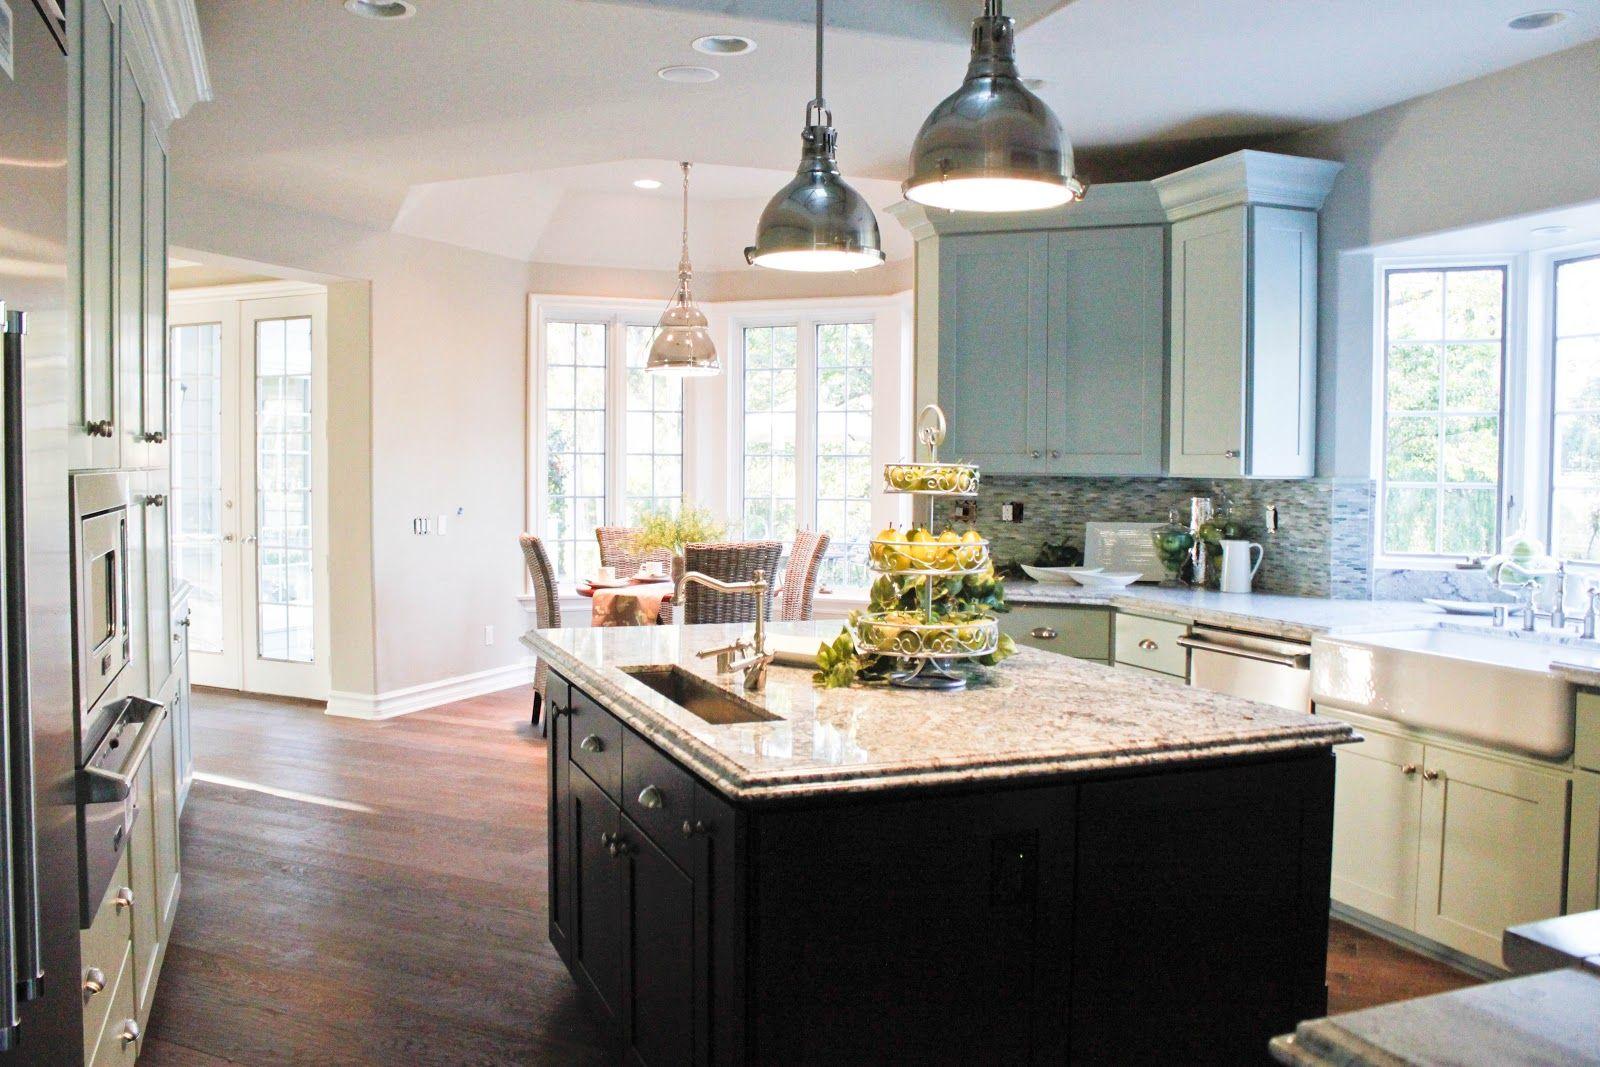 modern kitchen island pendant lighting Lighting fixtures